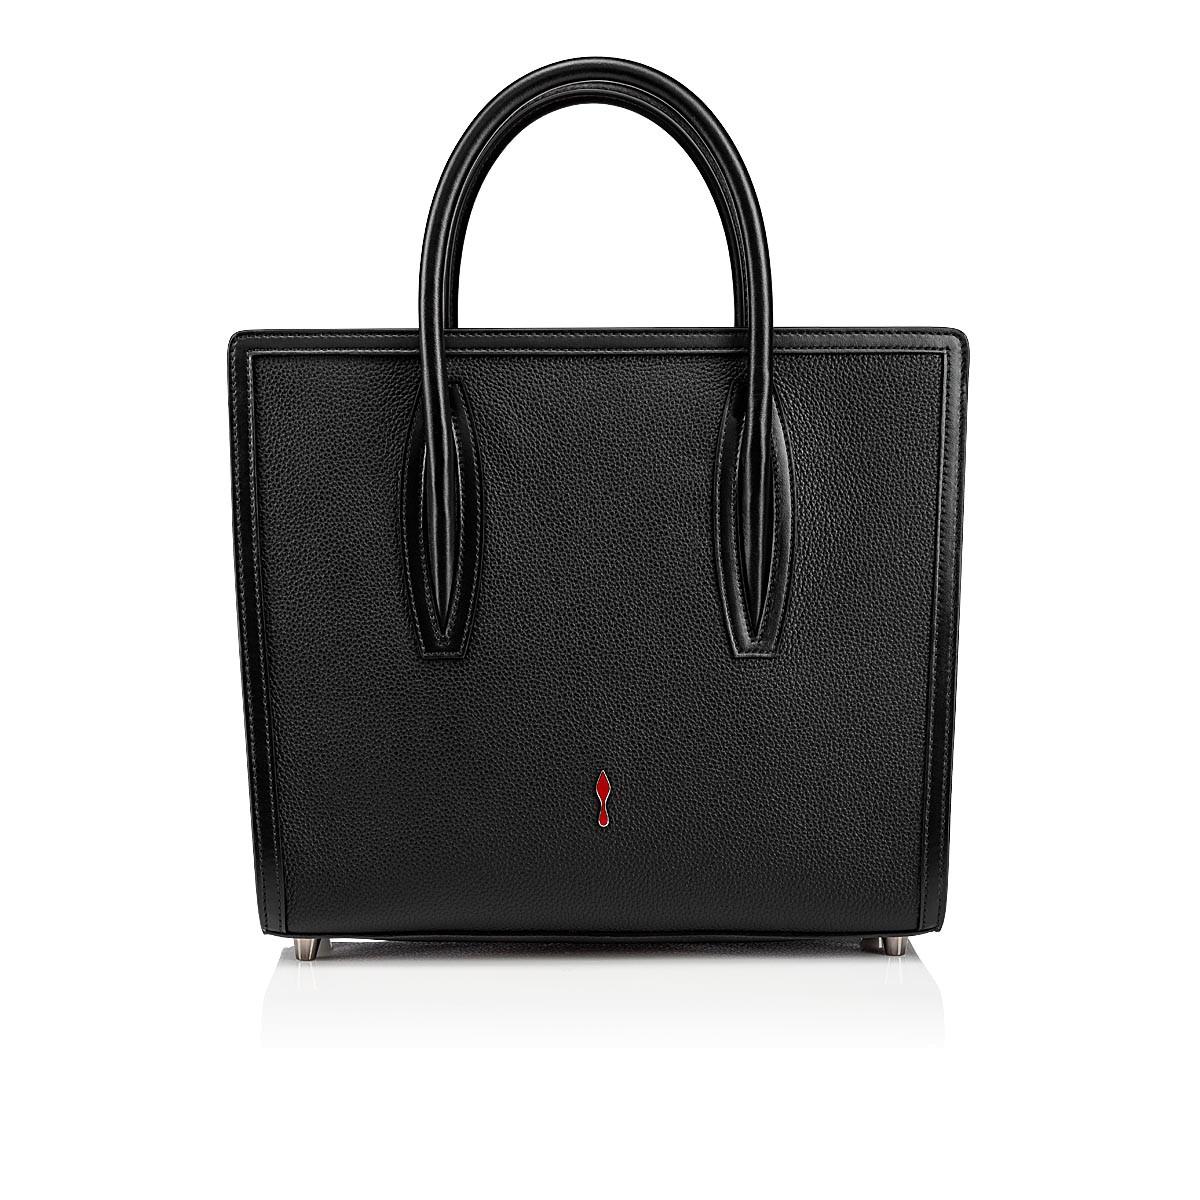 Bags - Paloma Medium - Christian Louboutin